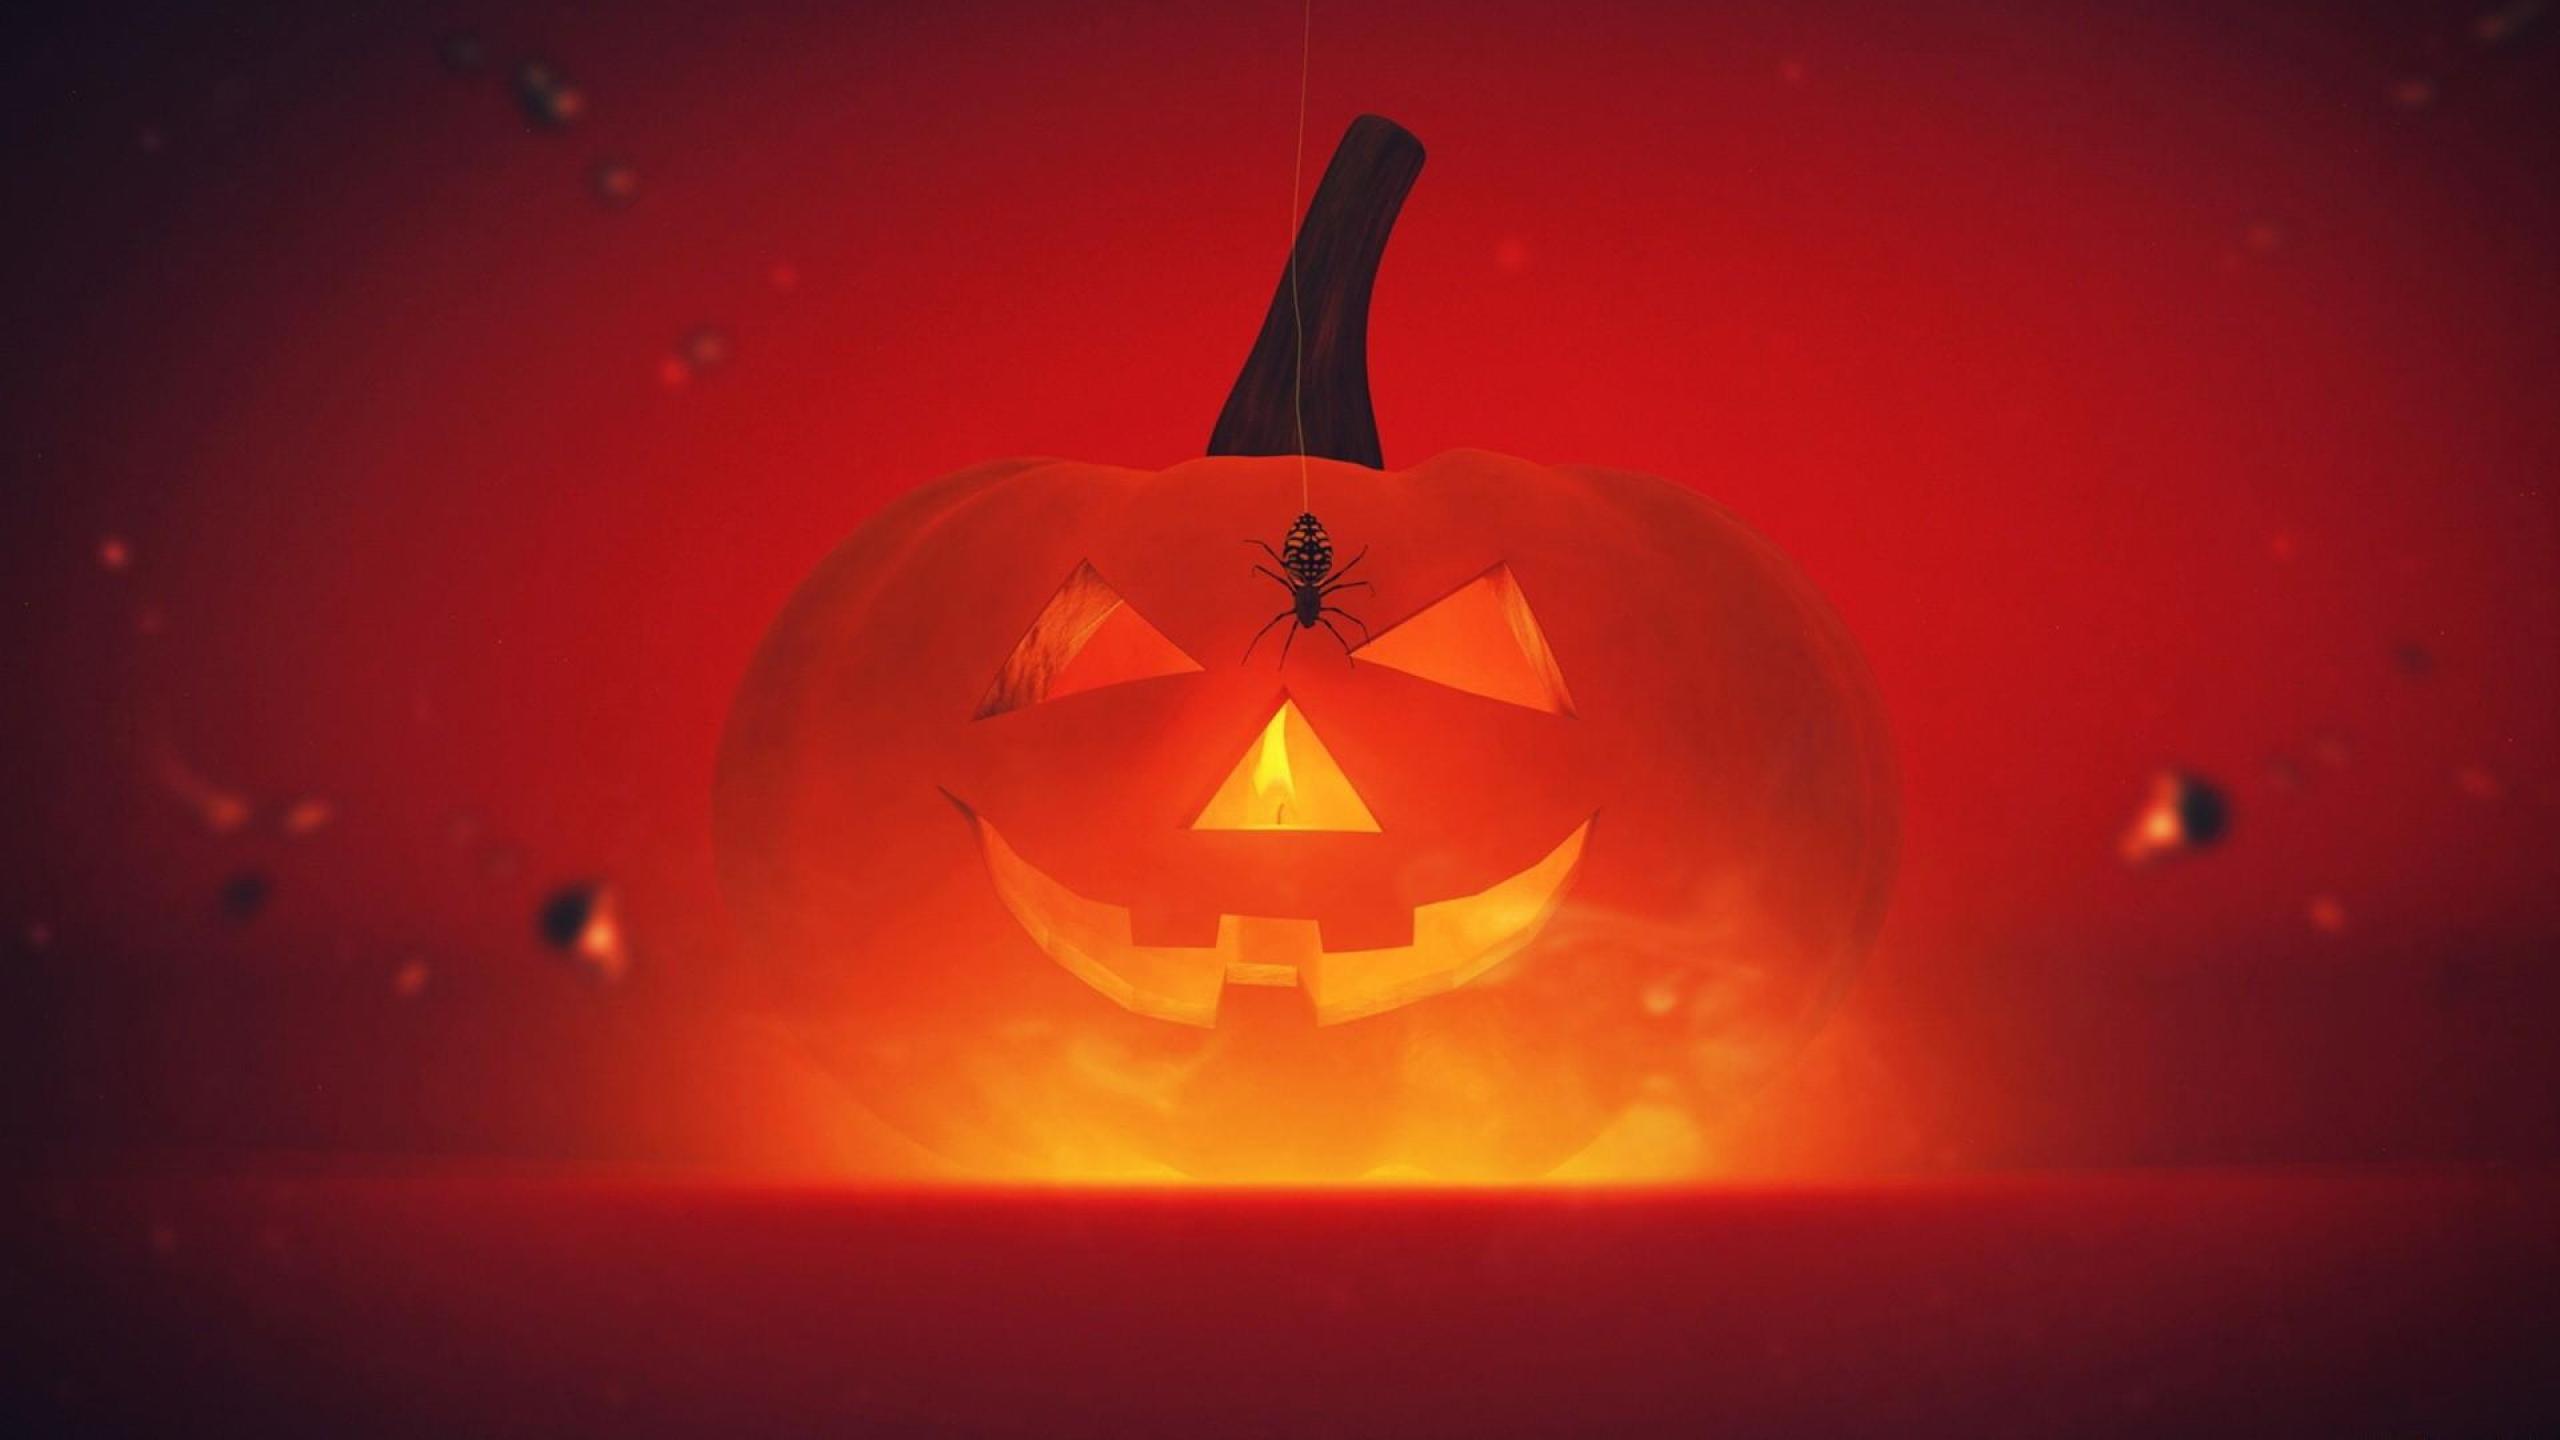 Hq Cute Baby Wallpapers Pumpkin Halloween Hd Wallpaper Pixelstalk Net